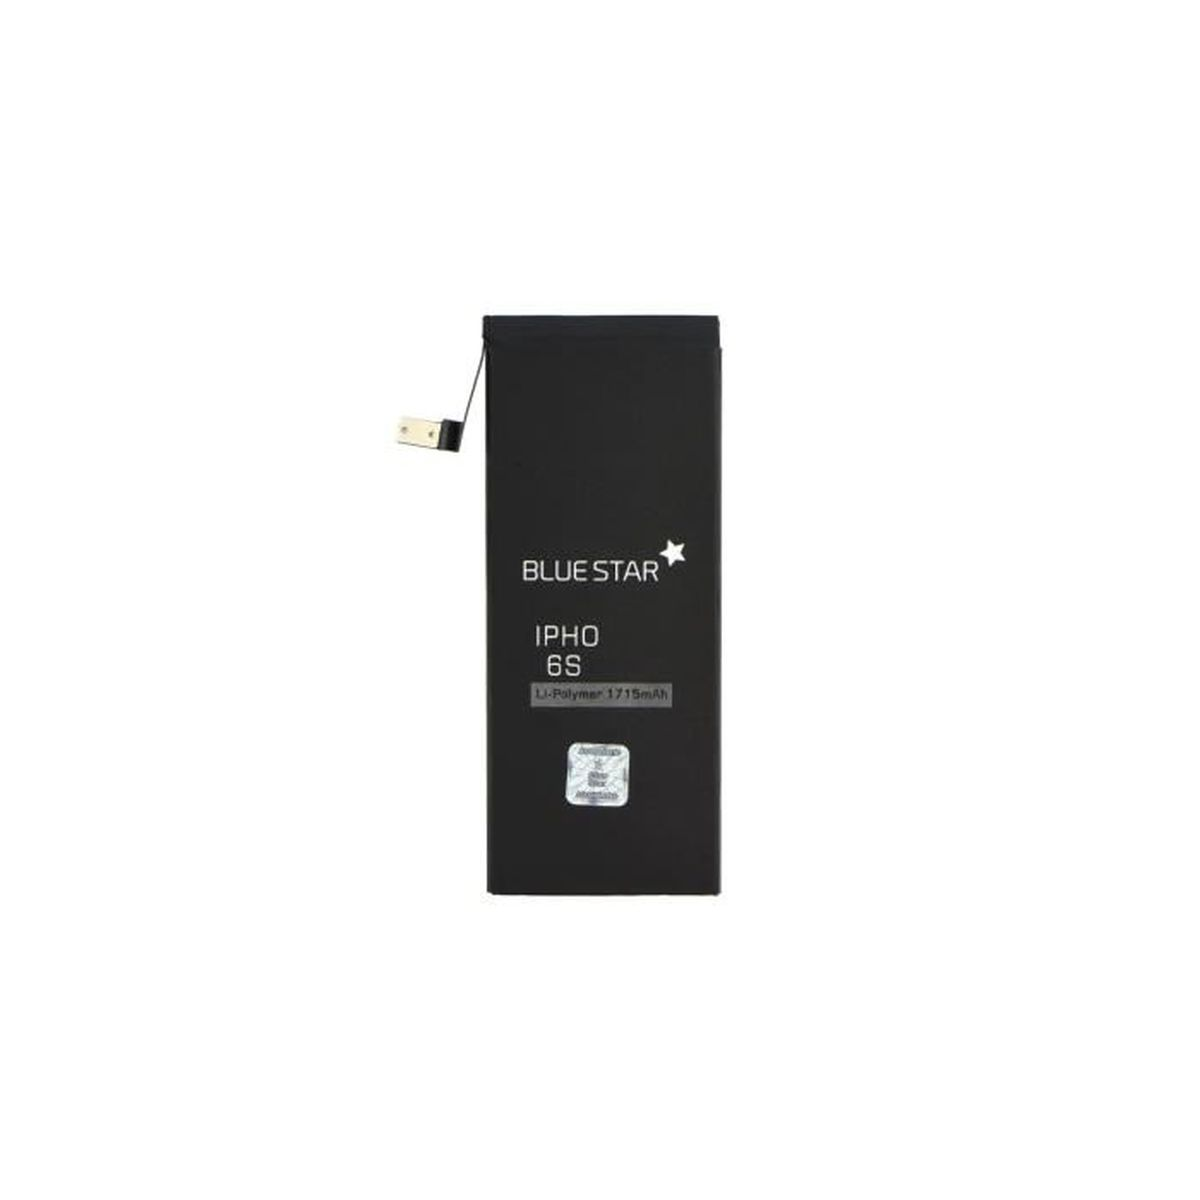 Batterie téléphone Batterie interne iPhone 6s 1710 mAh Polymer Premiu